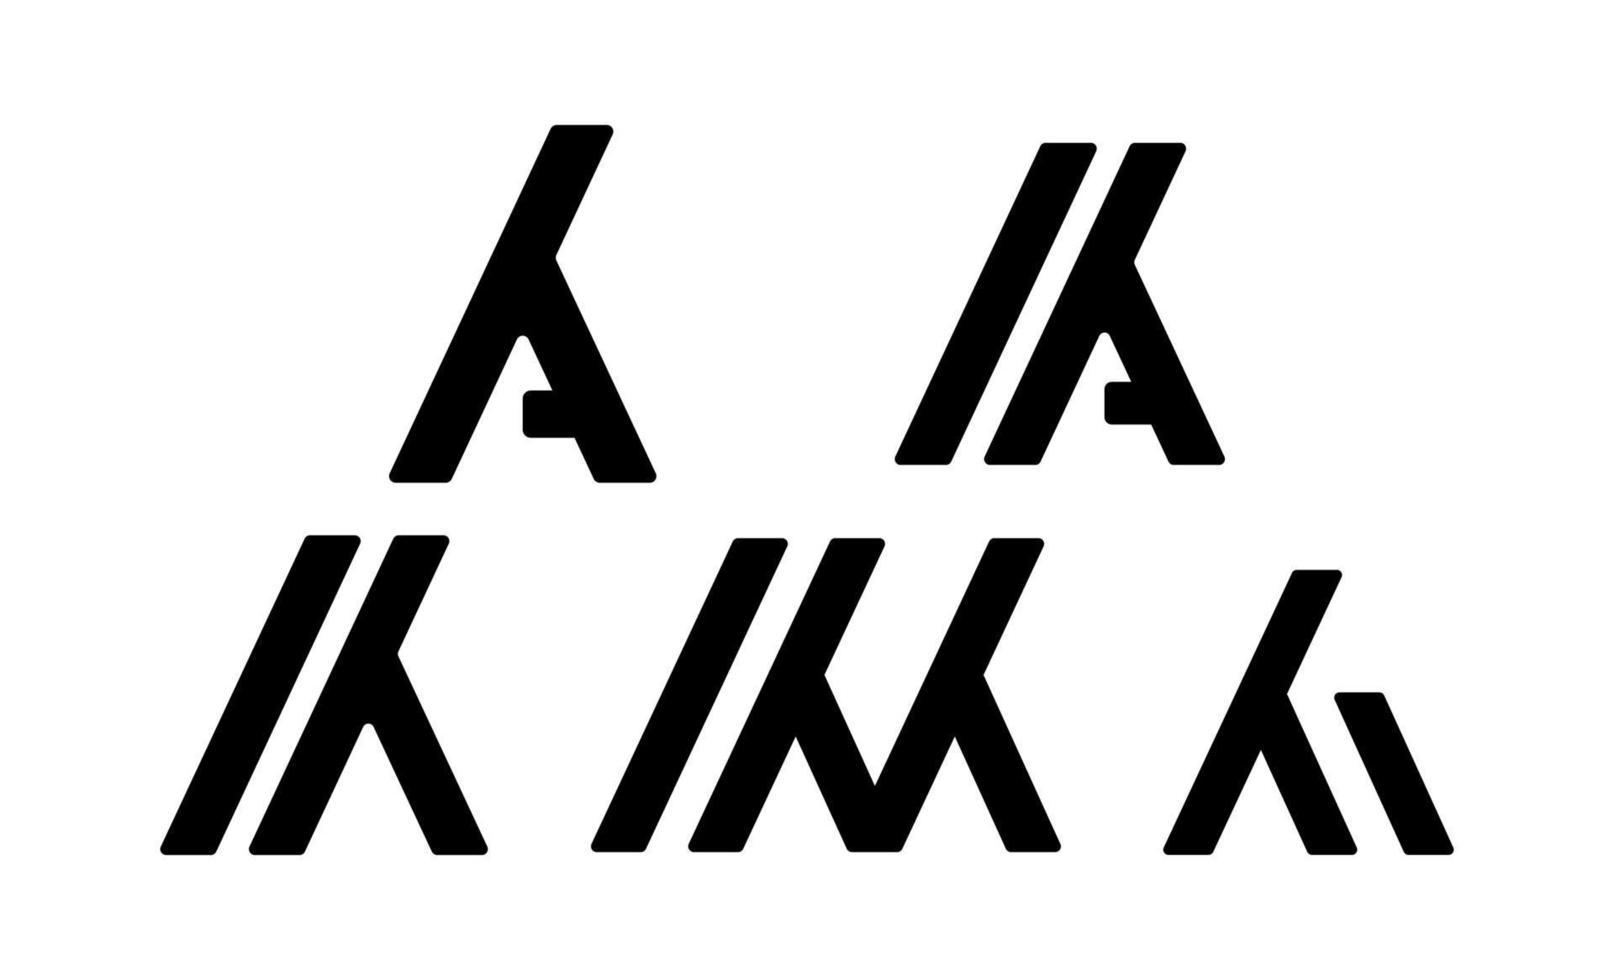 initial k, ka elegant logotyp mall vektorillustration vektor